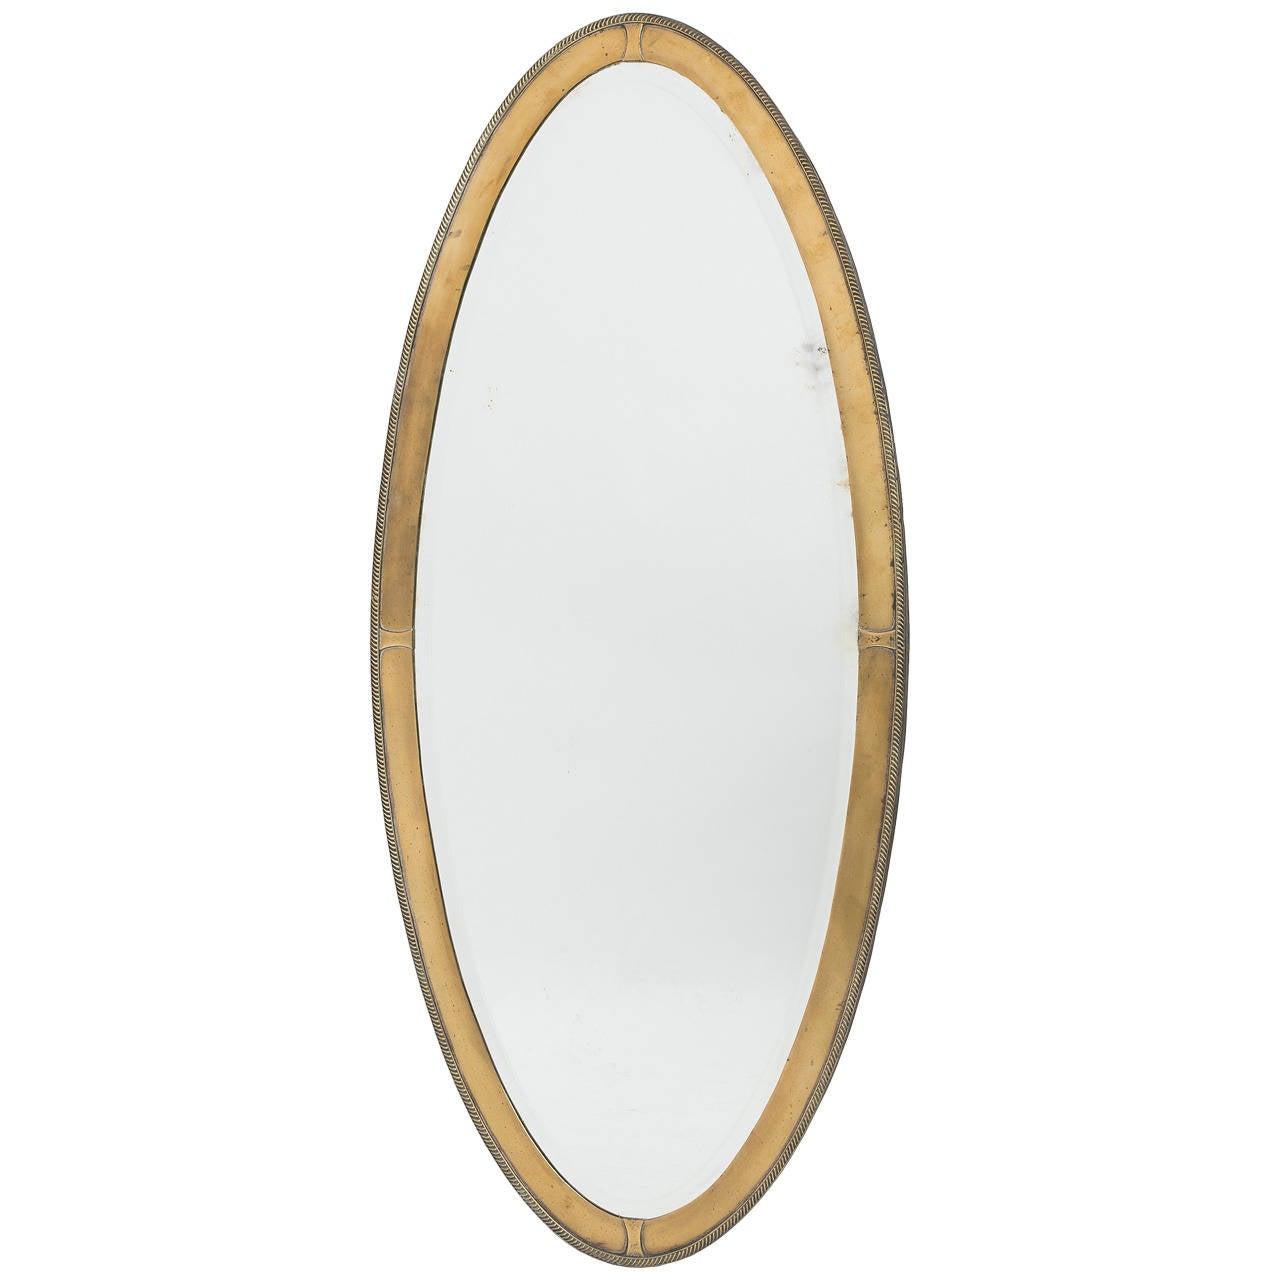 Elegant english edwardian oval brass mirror circa 1910 at for Elegant mirrors